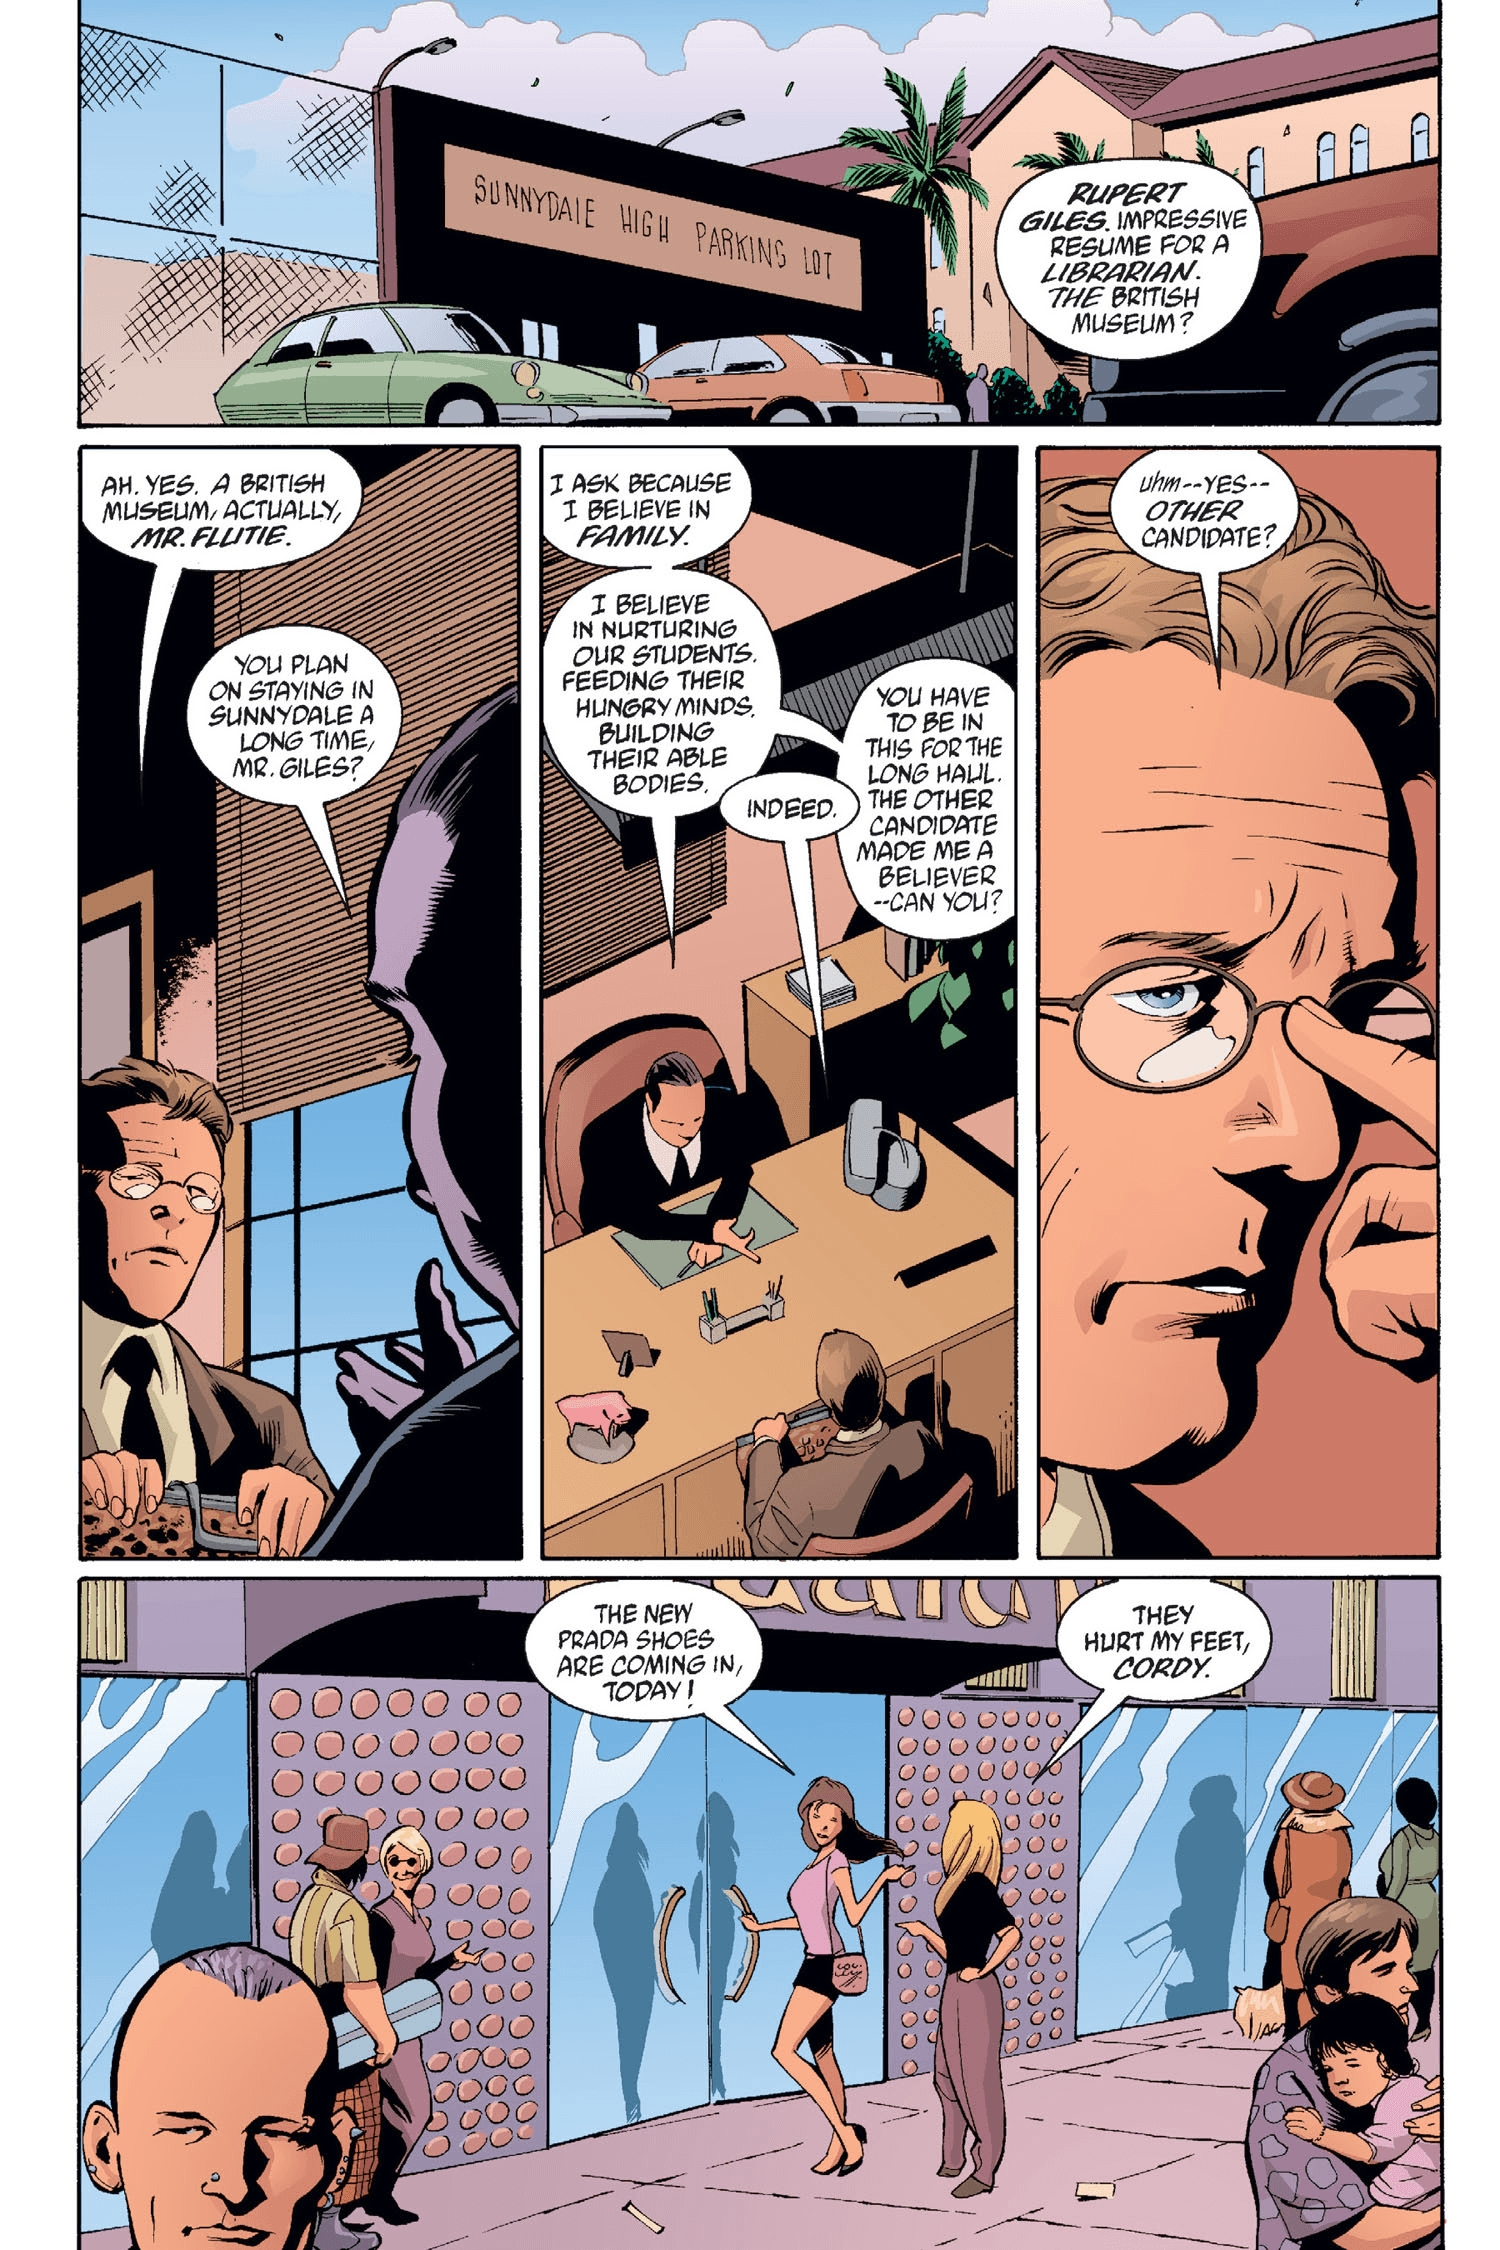 Read online Buffy the Vampire Slayer: Omnibus comic -  Issue # TPB 2 - 52